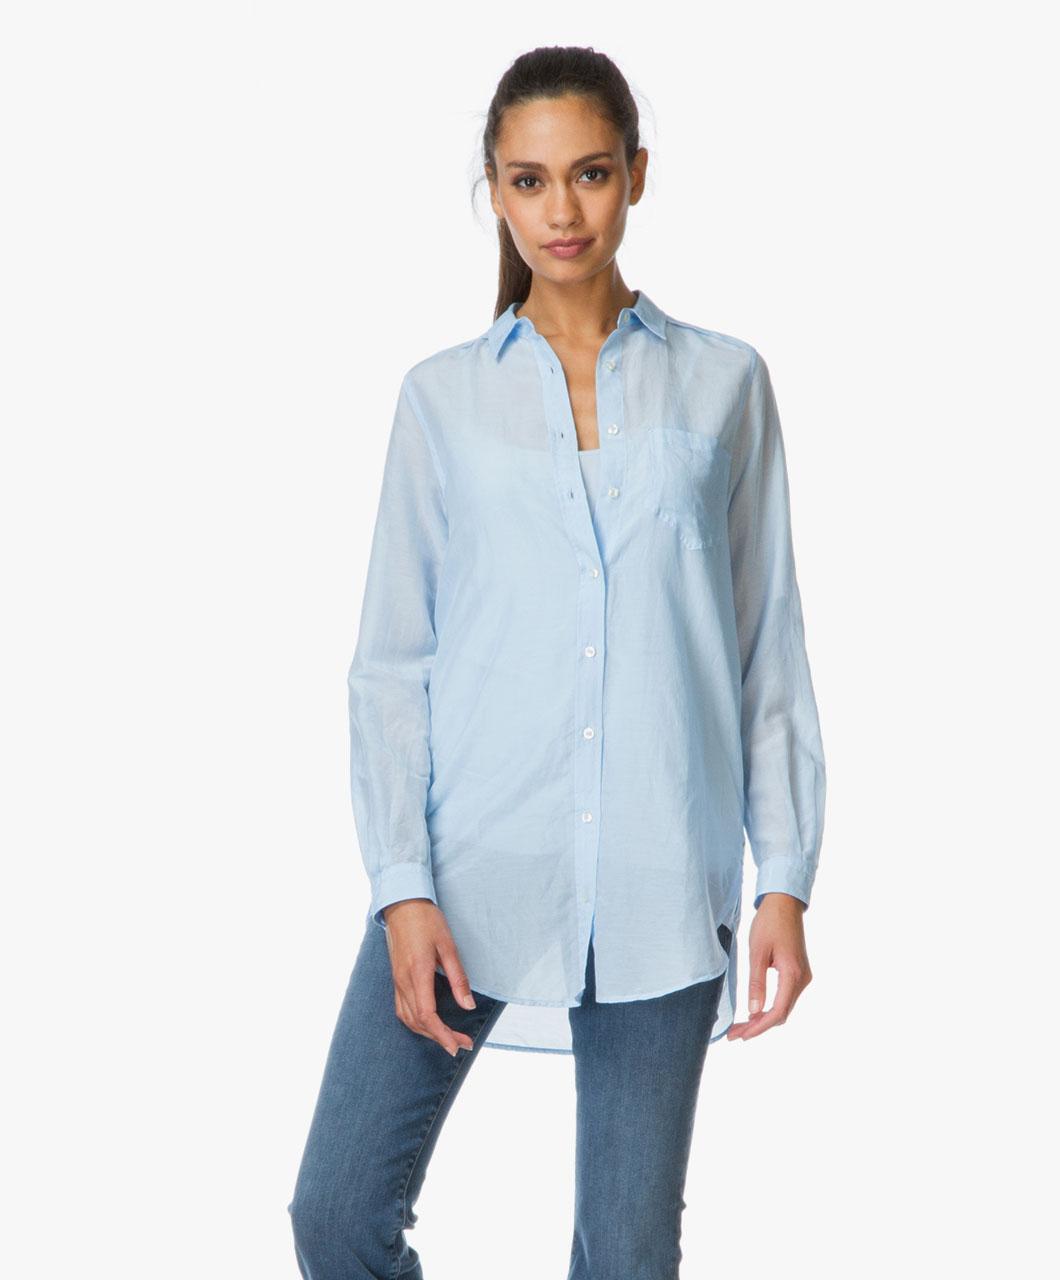 boss orange chrisler long blouse light blue 50302101 454 light. Black Bedroom Furniture Sets. Home Design Ideas